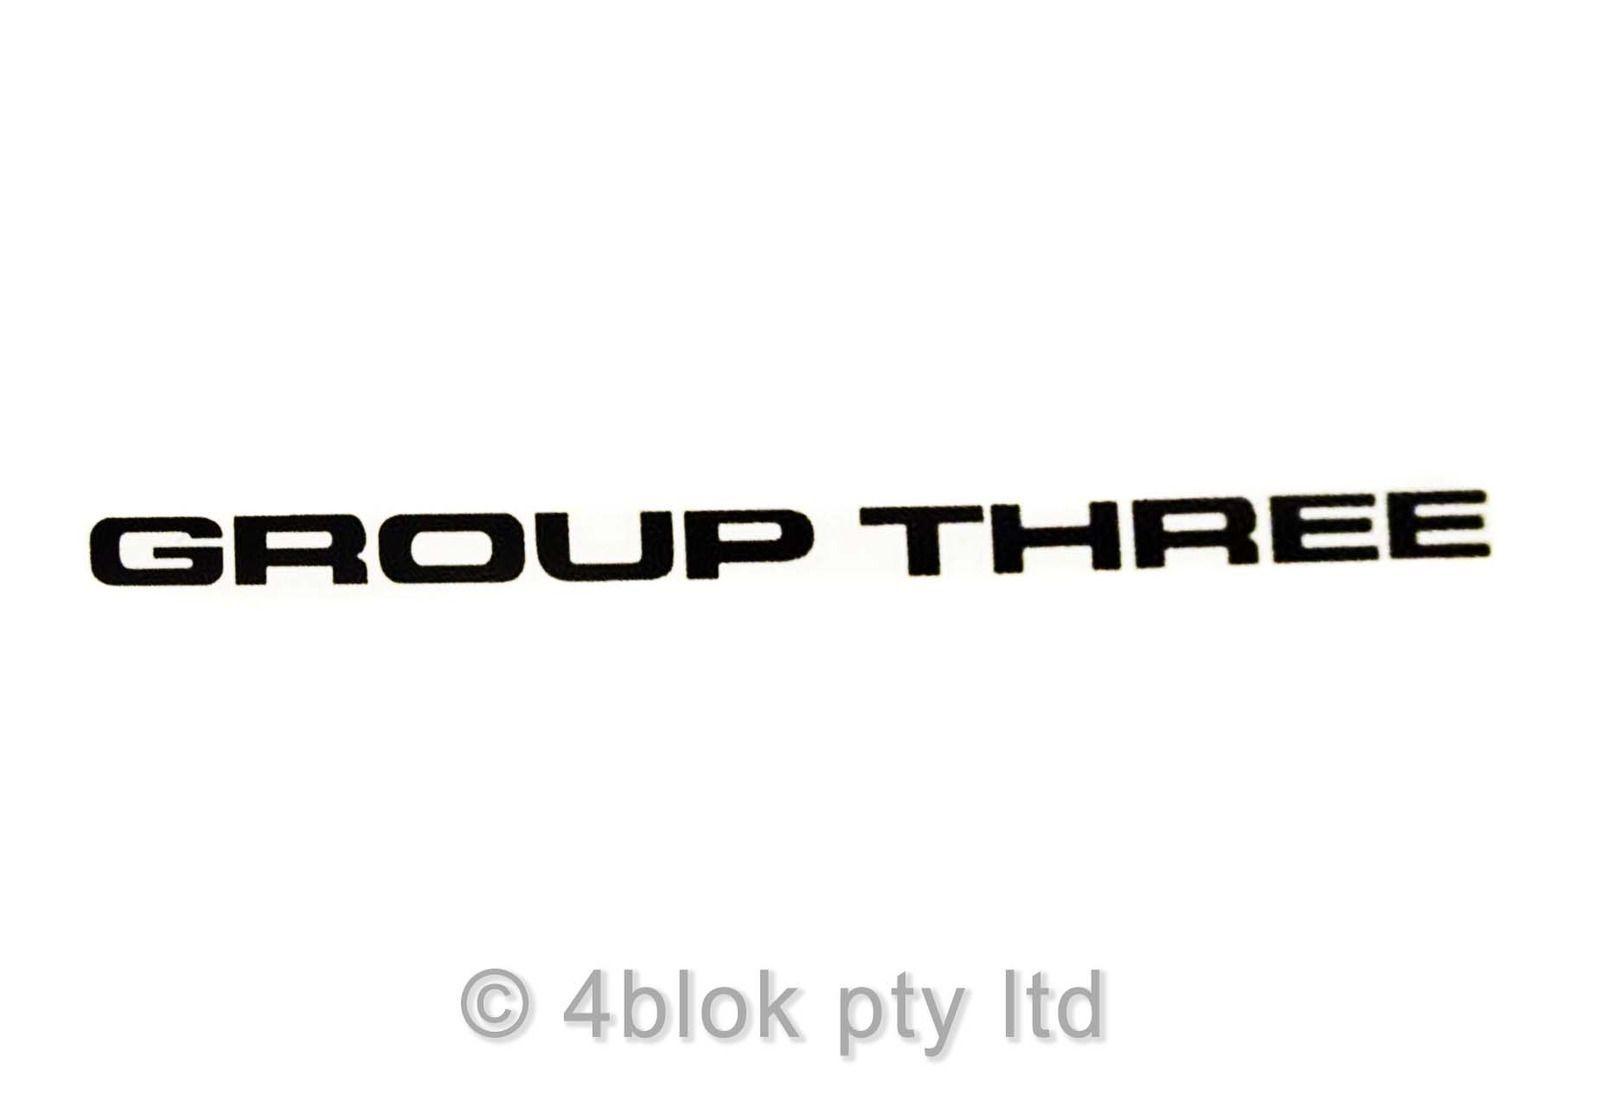 Hdt Vl Group Three